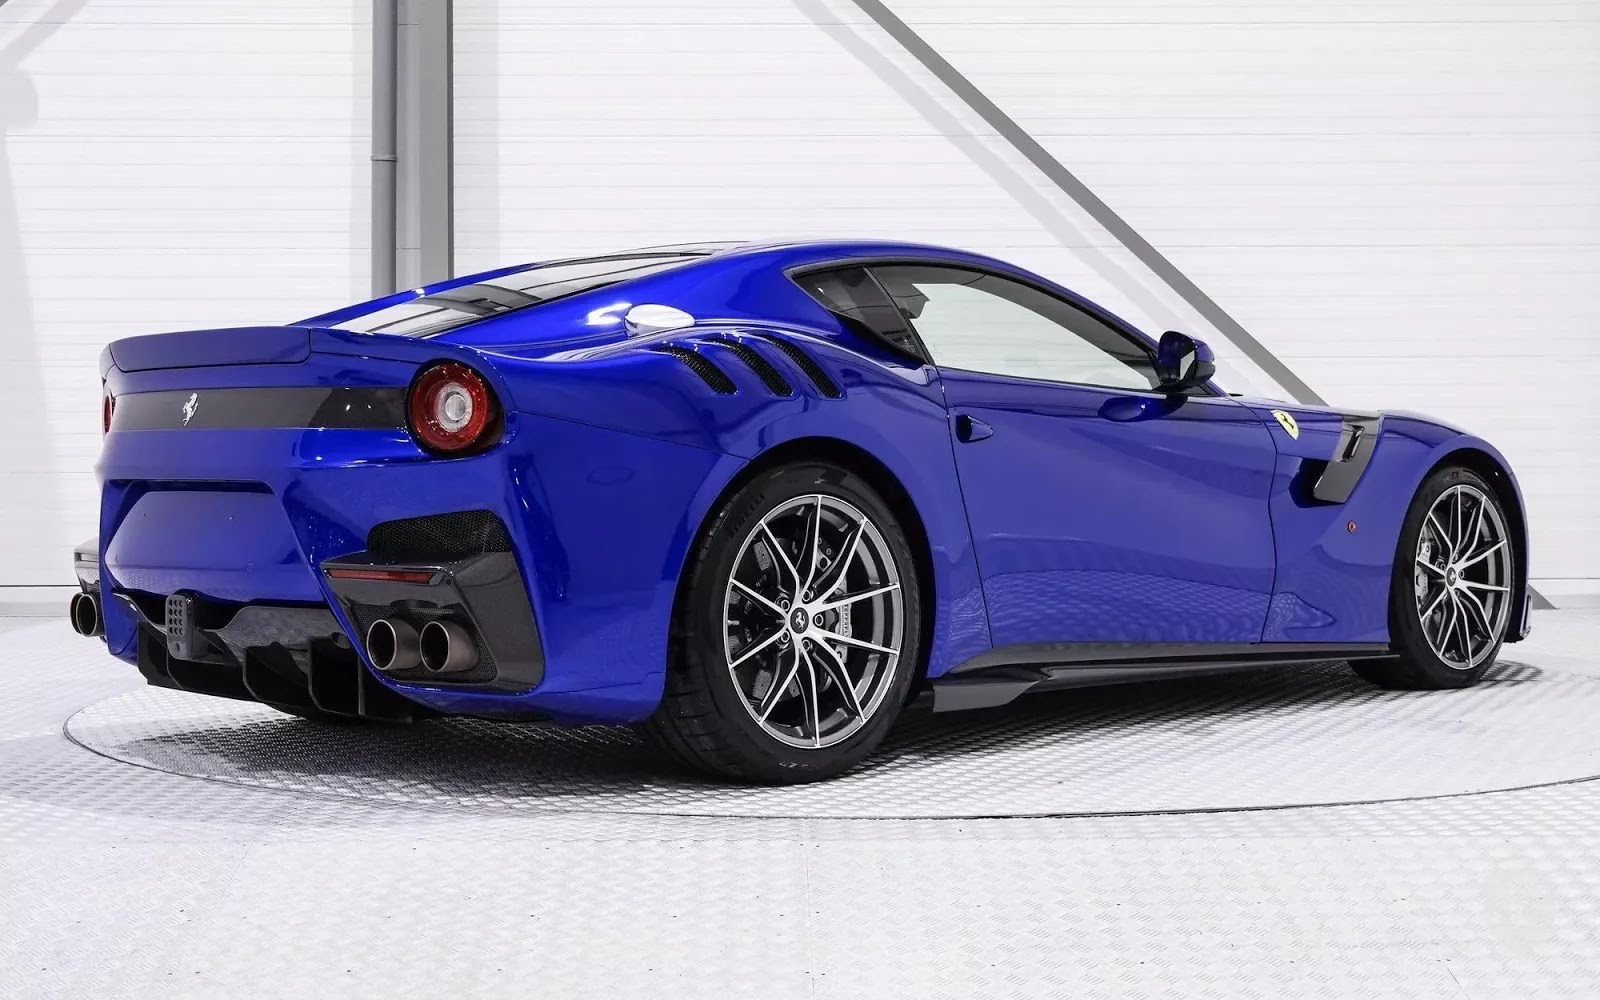 One-Off_Electric_Blue_Ferrari_F12tdf_03